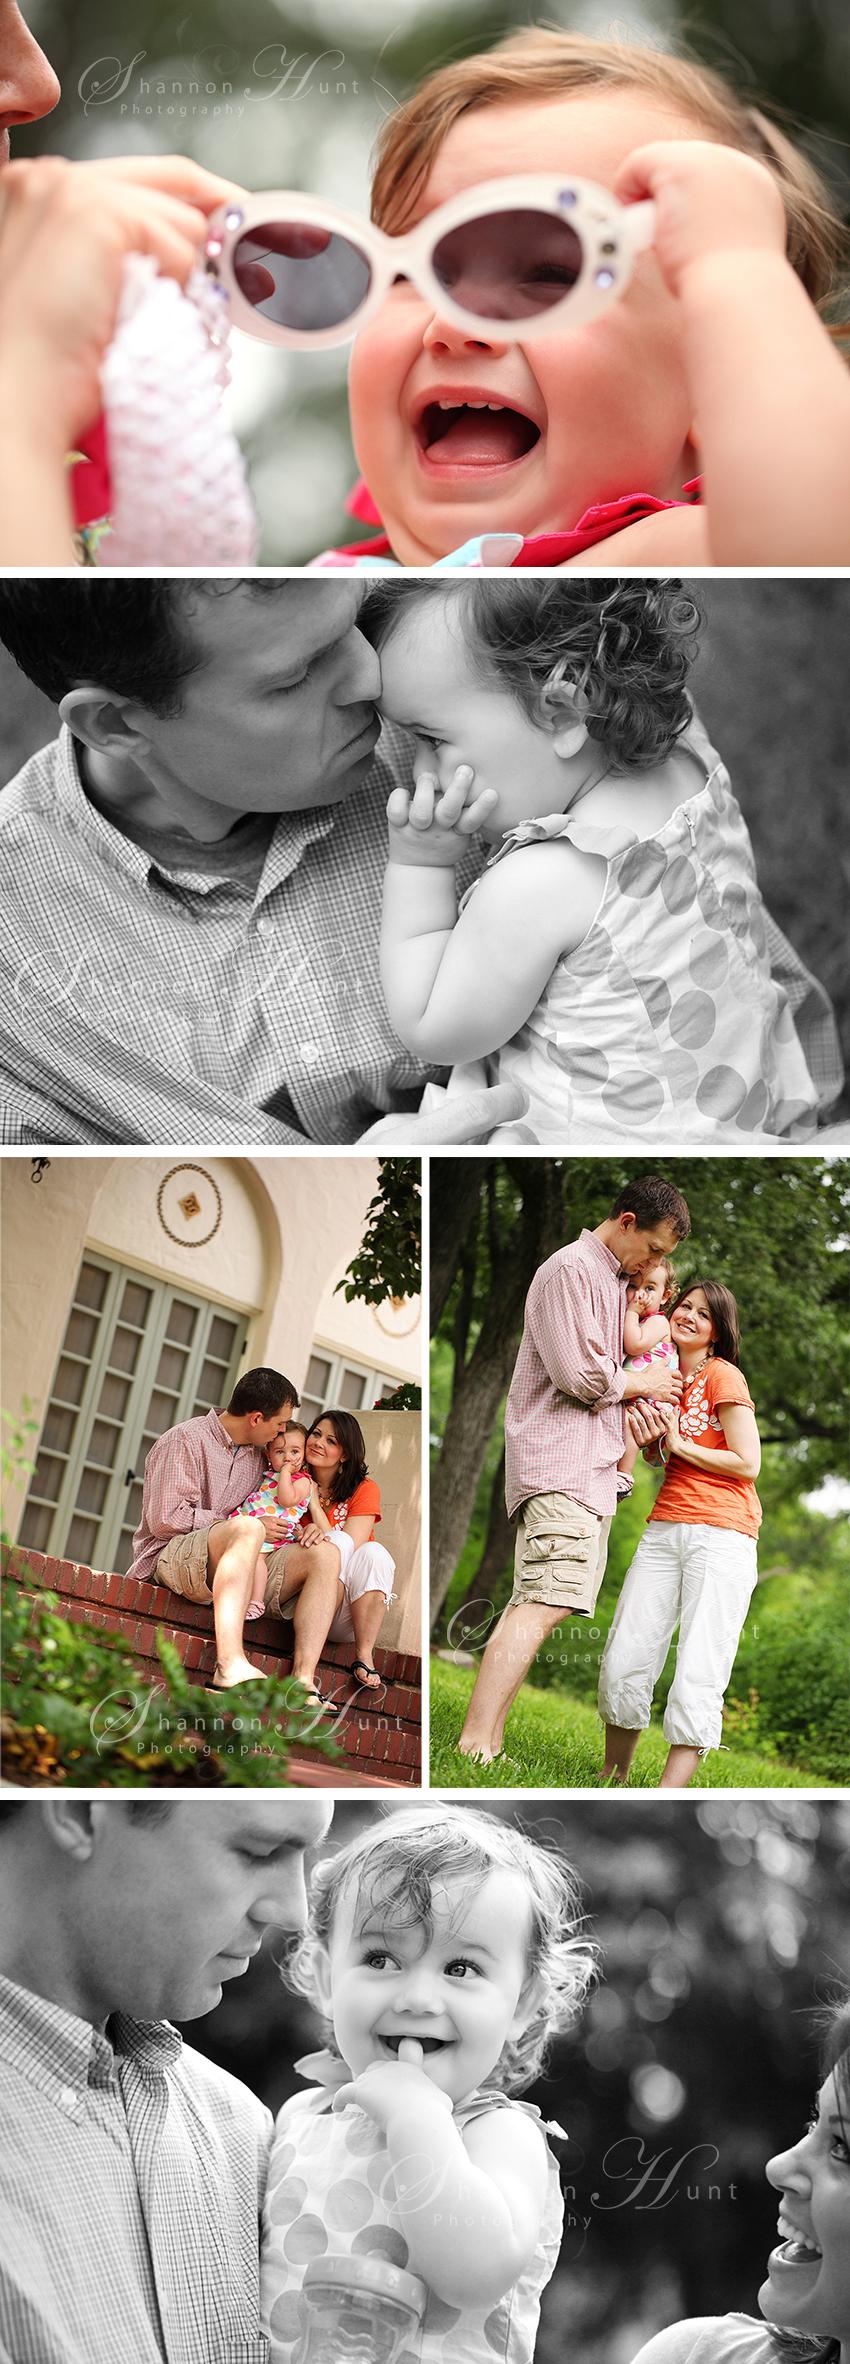 blog_collage2